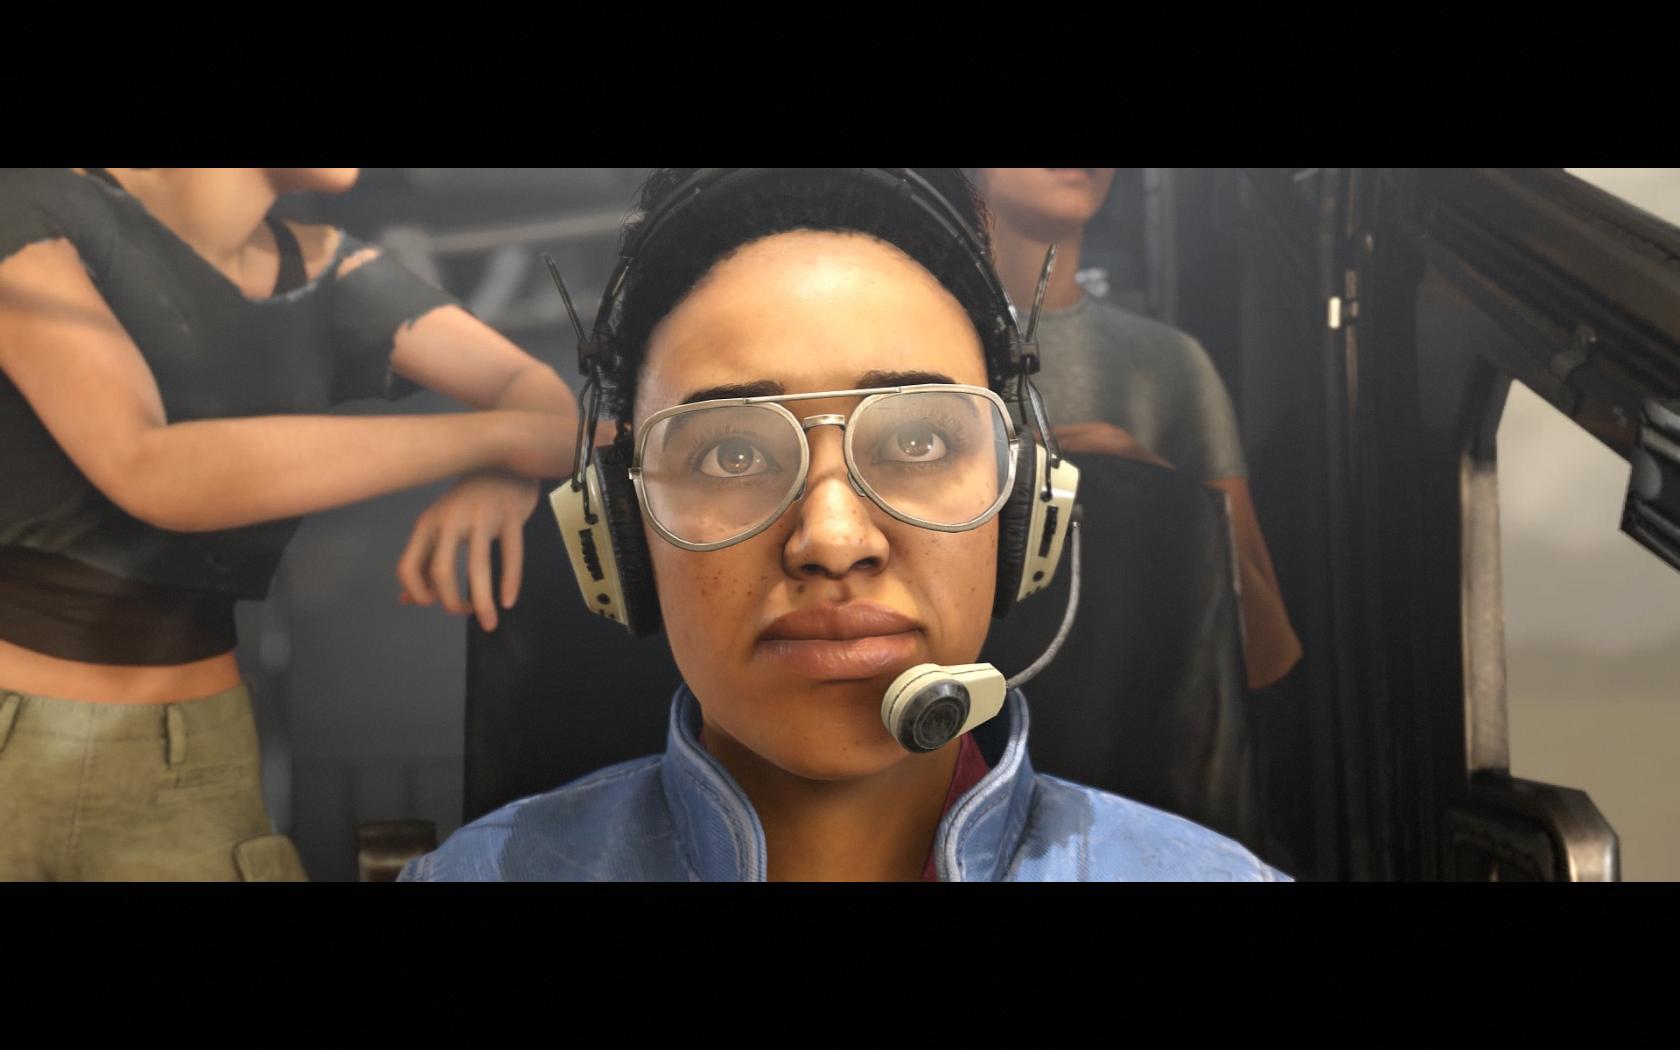 Wolfenstein  Youngblood Screenshot 2019.07.28 - 05.04.41.77.png